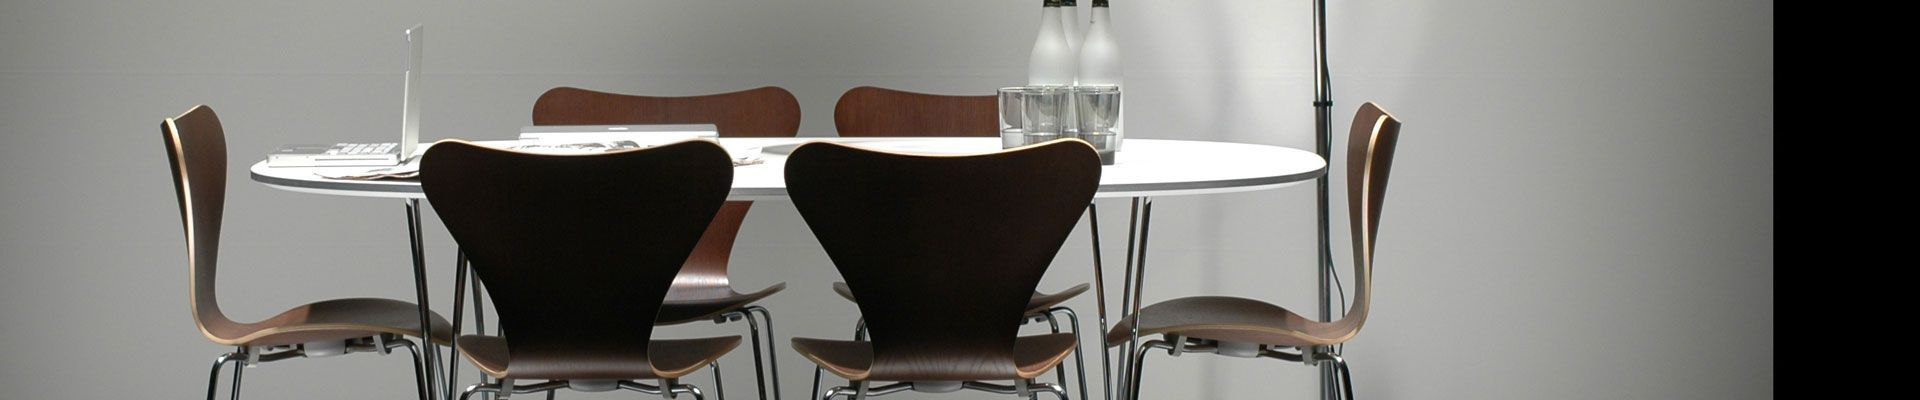 Fritz Hansen stoelen